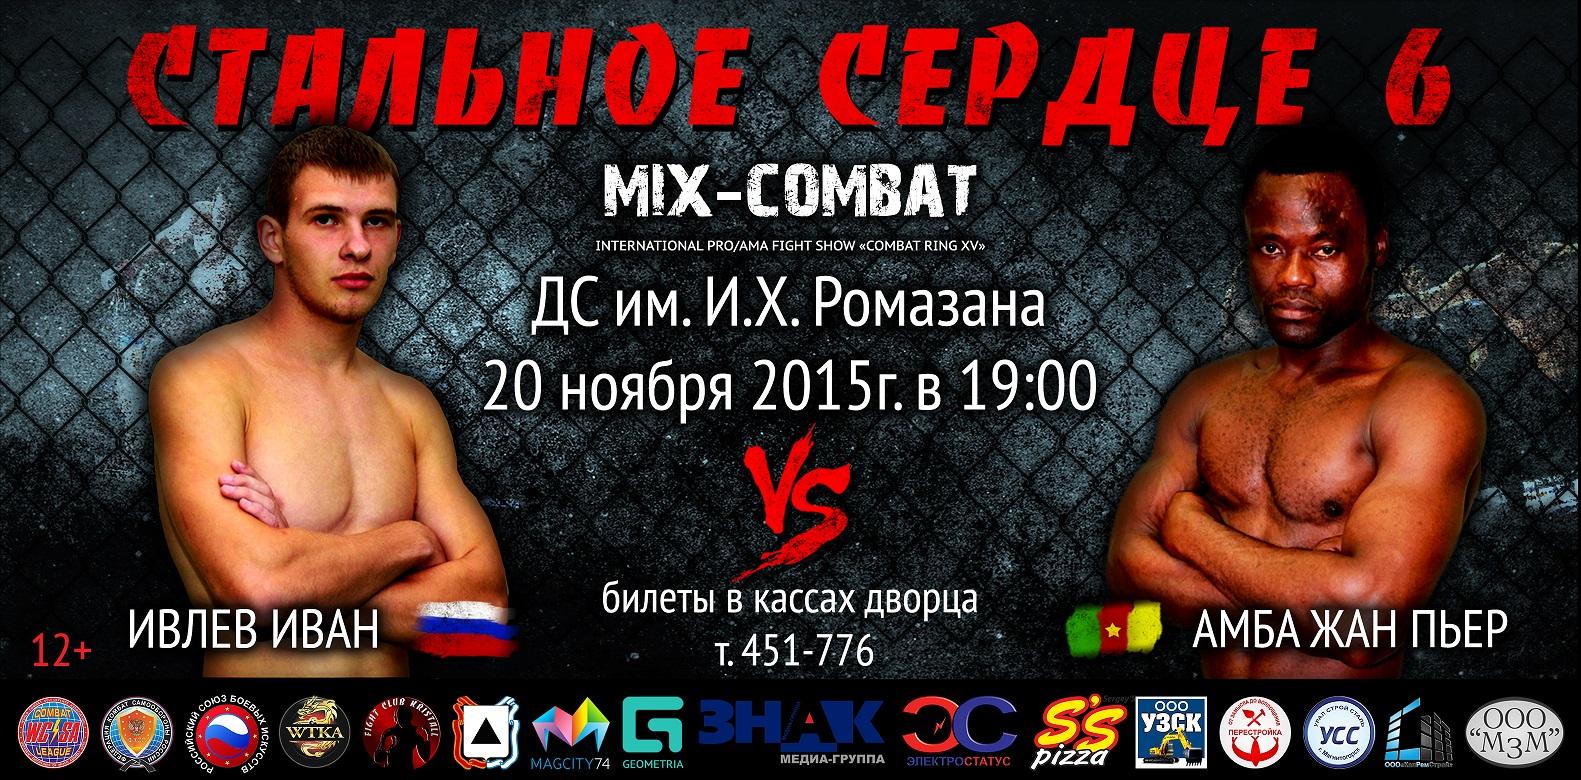 http://combatsd.ru/images/upload/СС-15.jpg